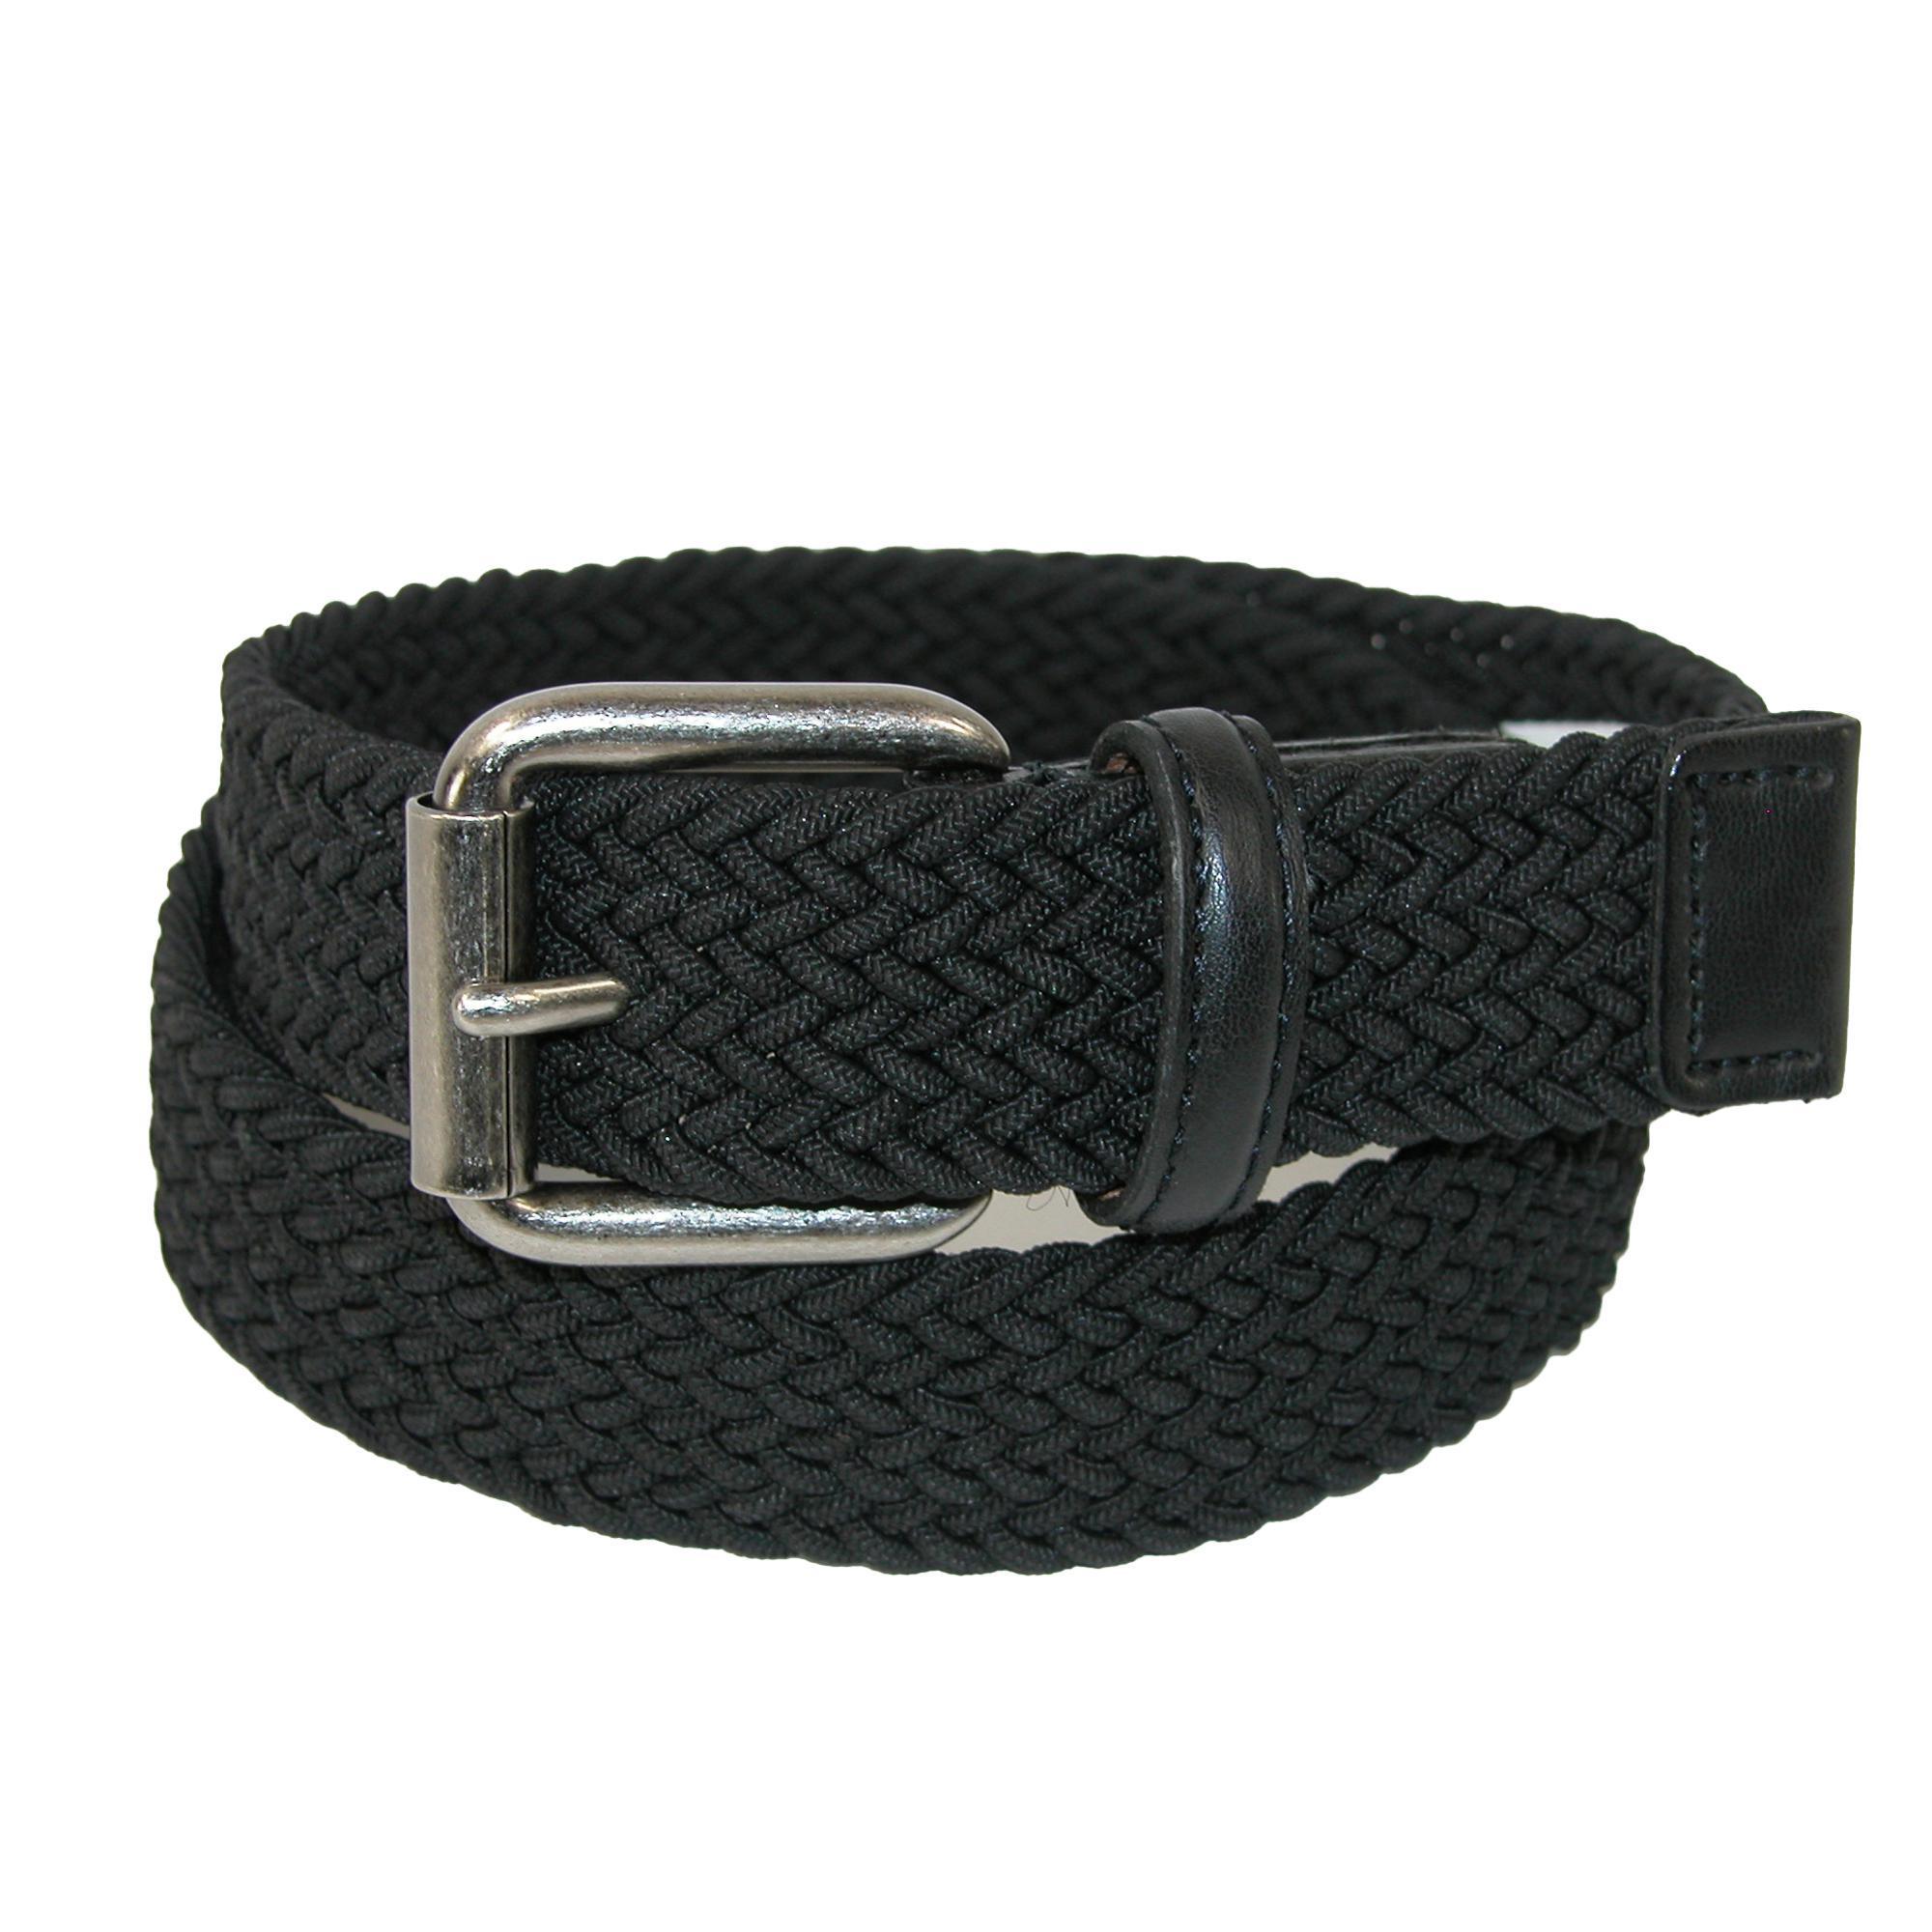 Aquarius Boys Braided Belt with Single Prong Buckle